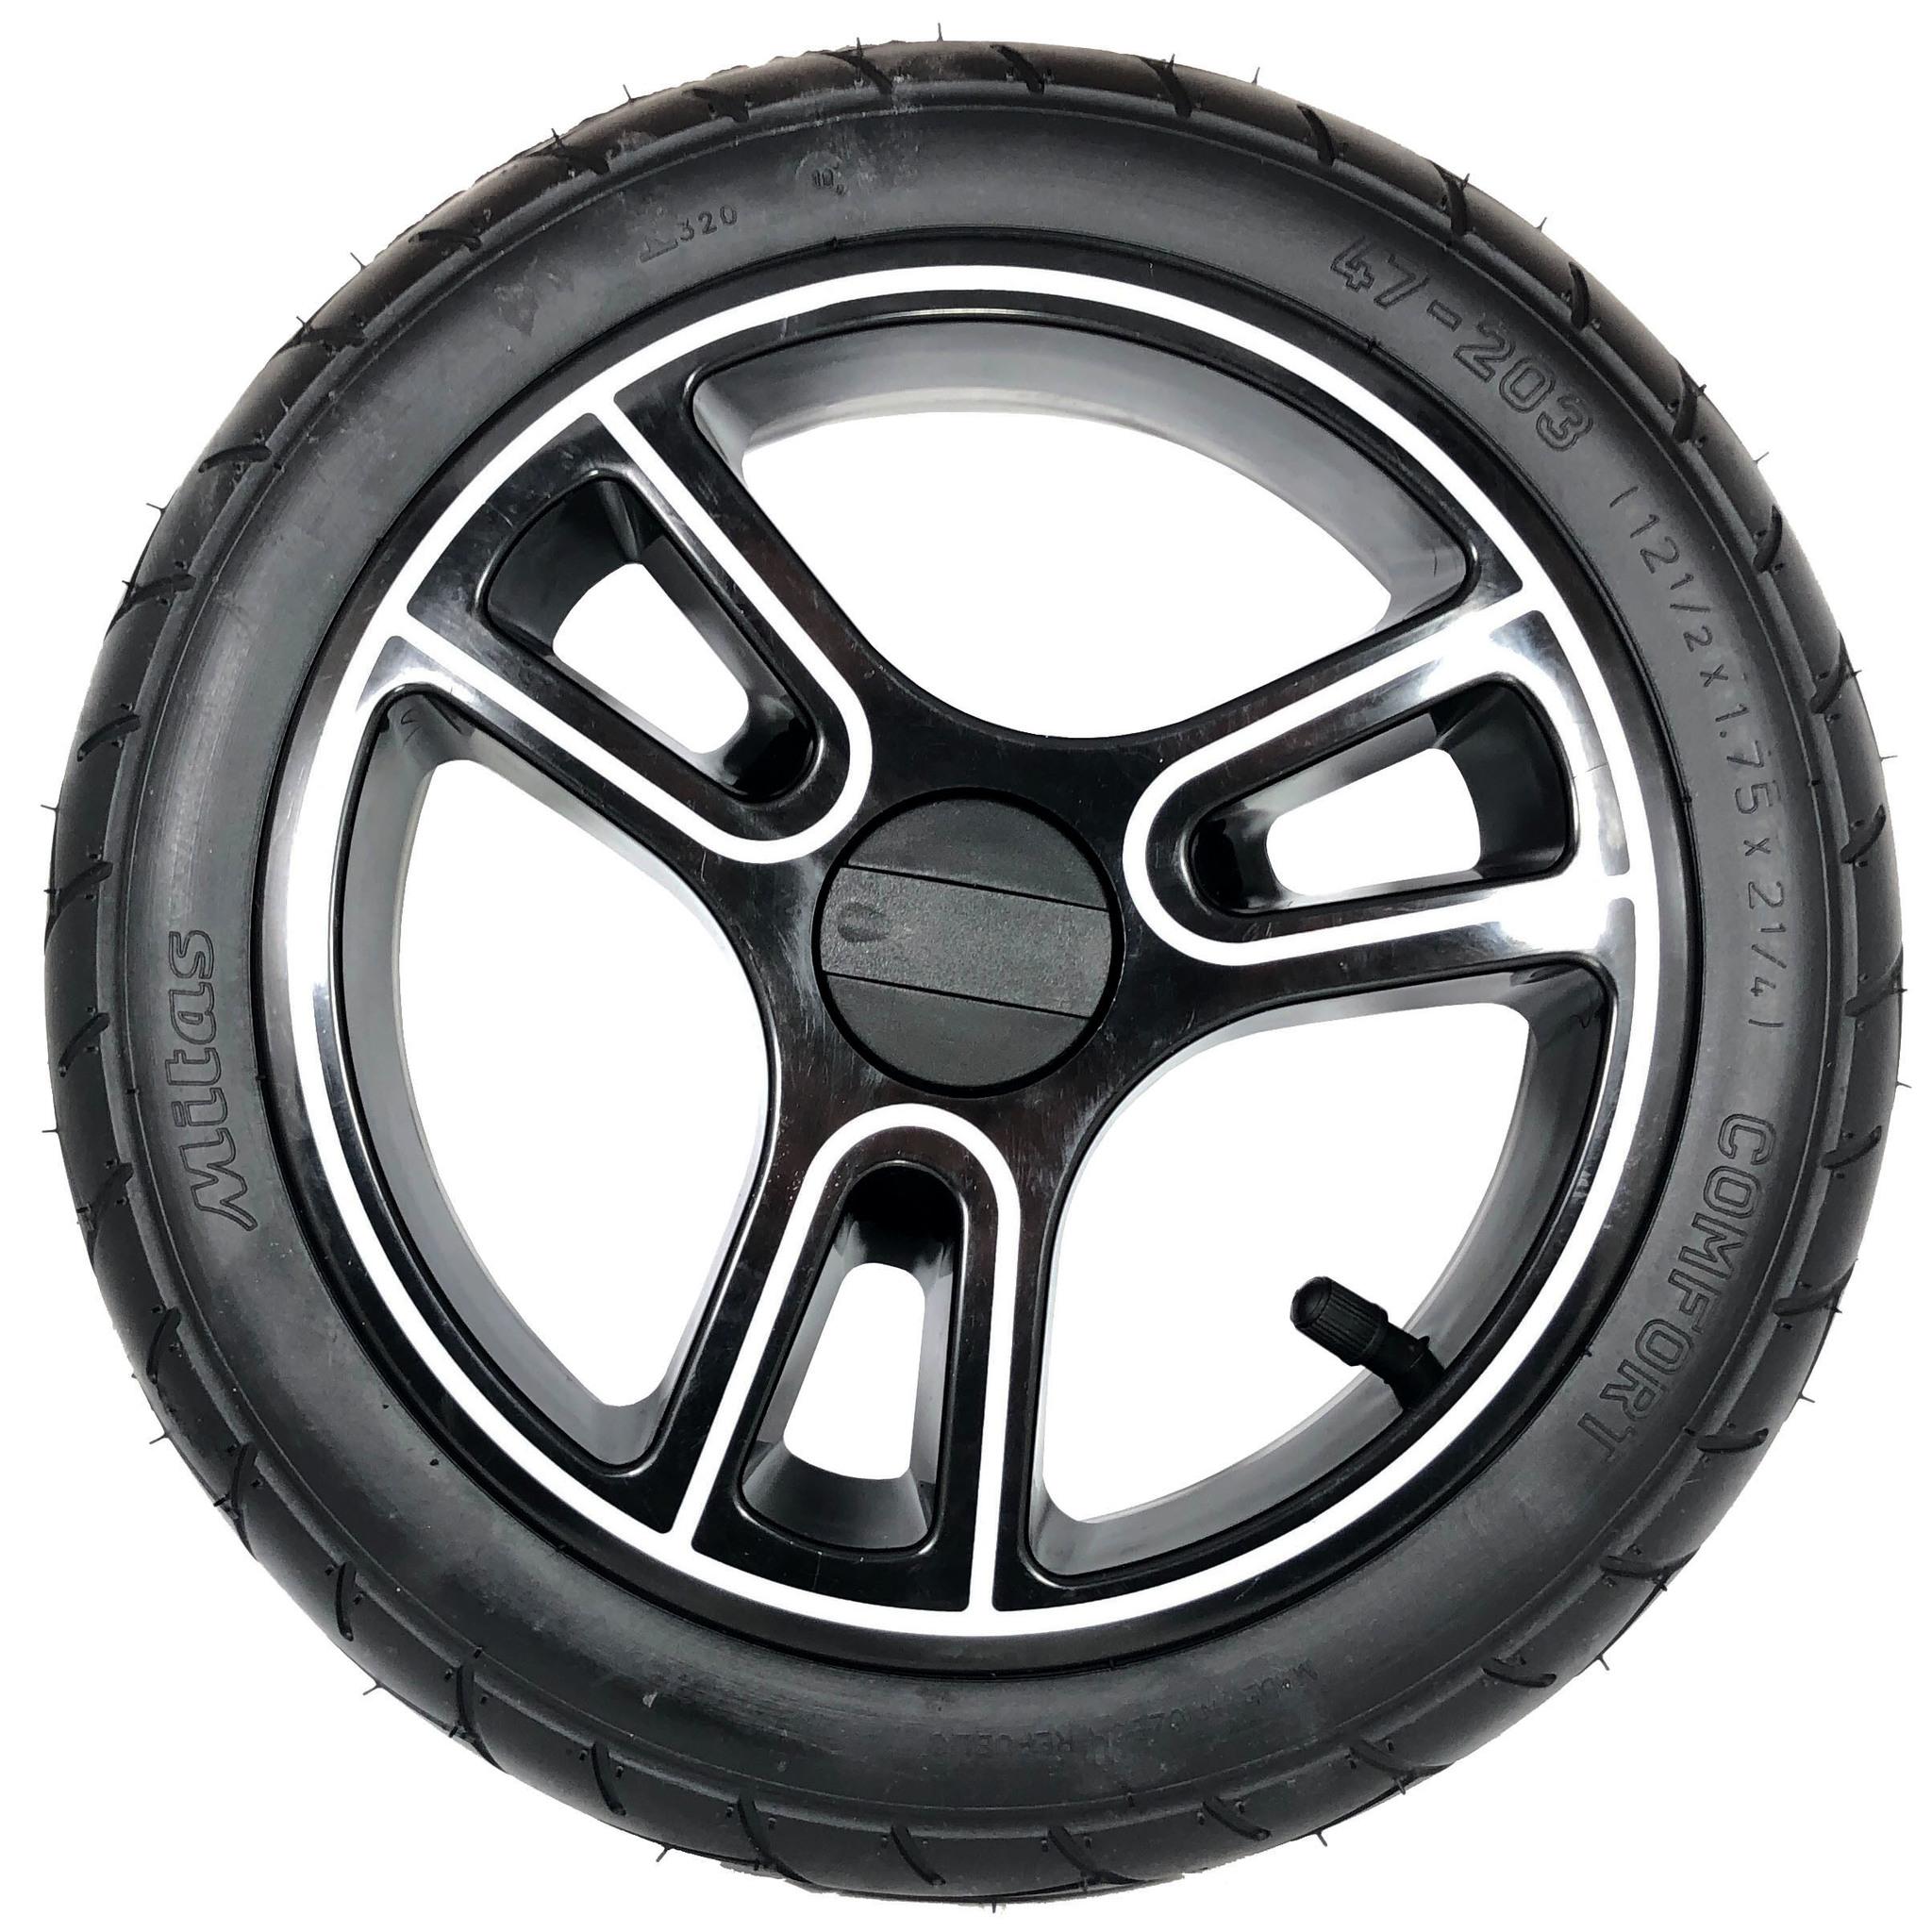 Колесо Vikalex Lazzara/Cochinella 12 1/2 x 1.75 x 2 1/4 колесо_вимкалекс_лазара_12.jpg